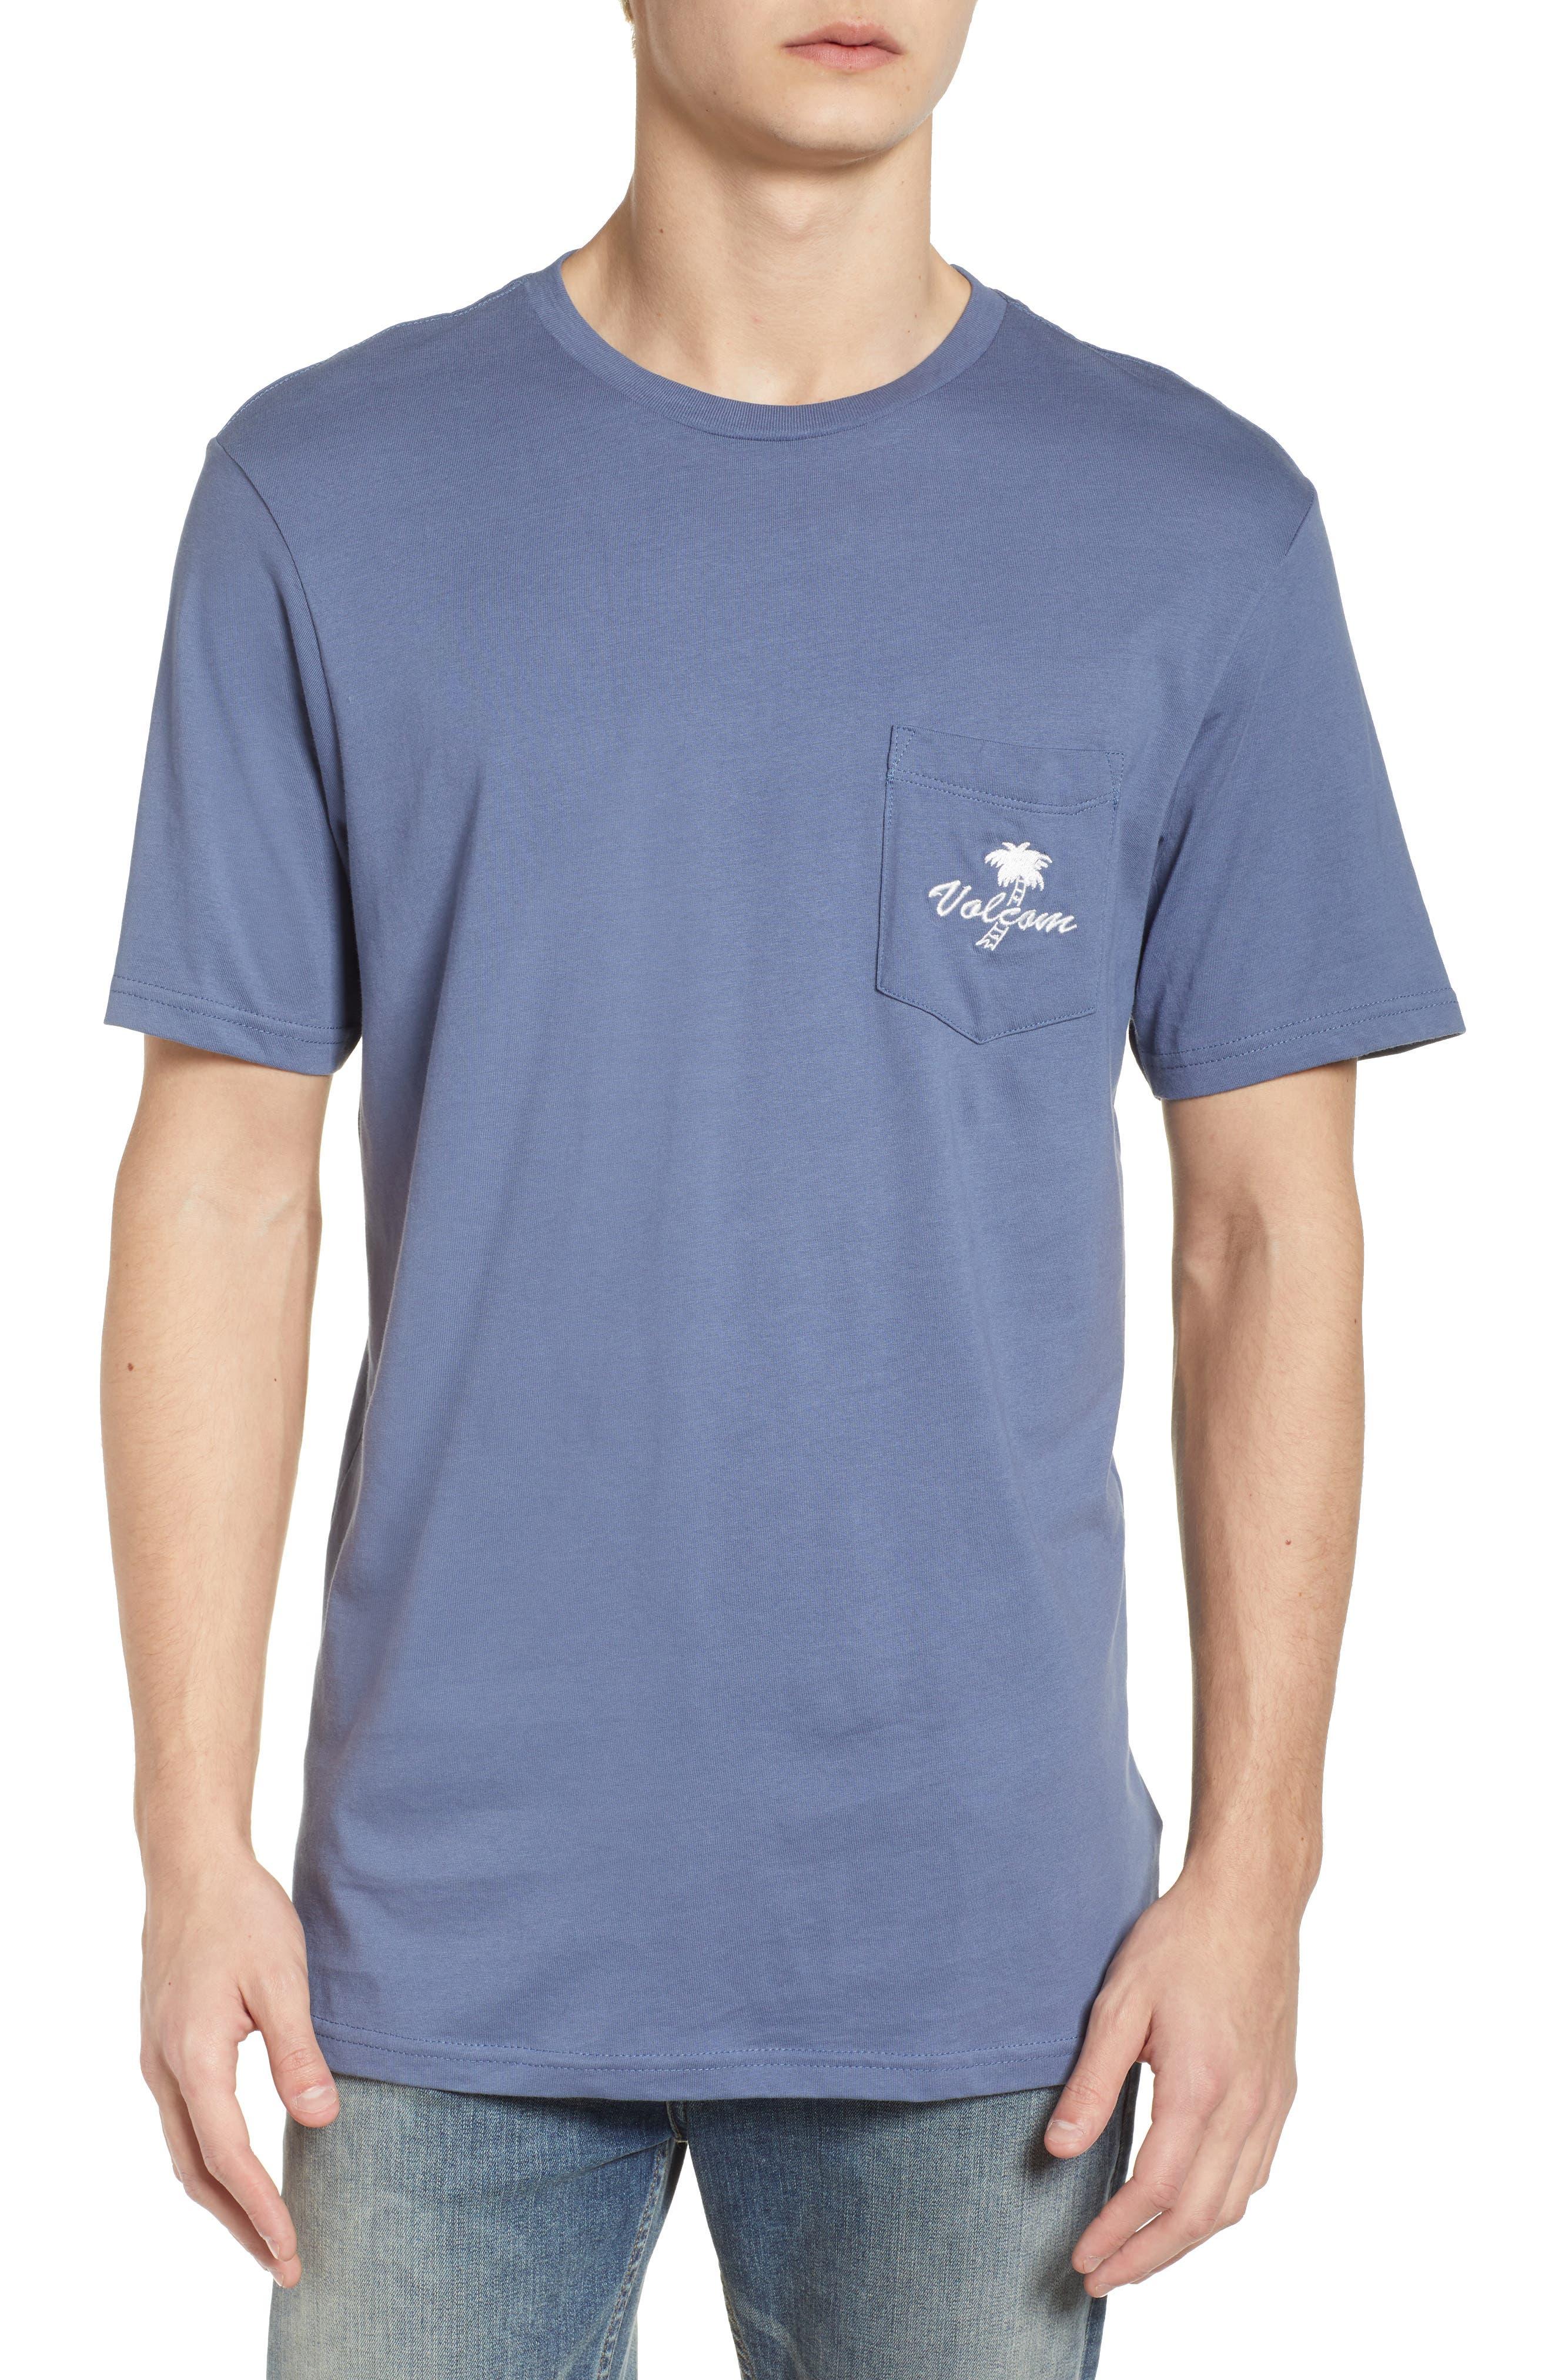 Last Resort Pocket T-Shirt,                             Main thumbnail 1, color,                             Deep Blue